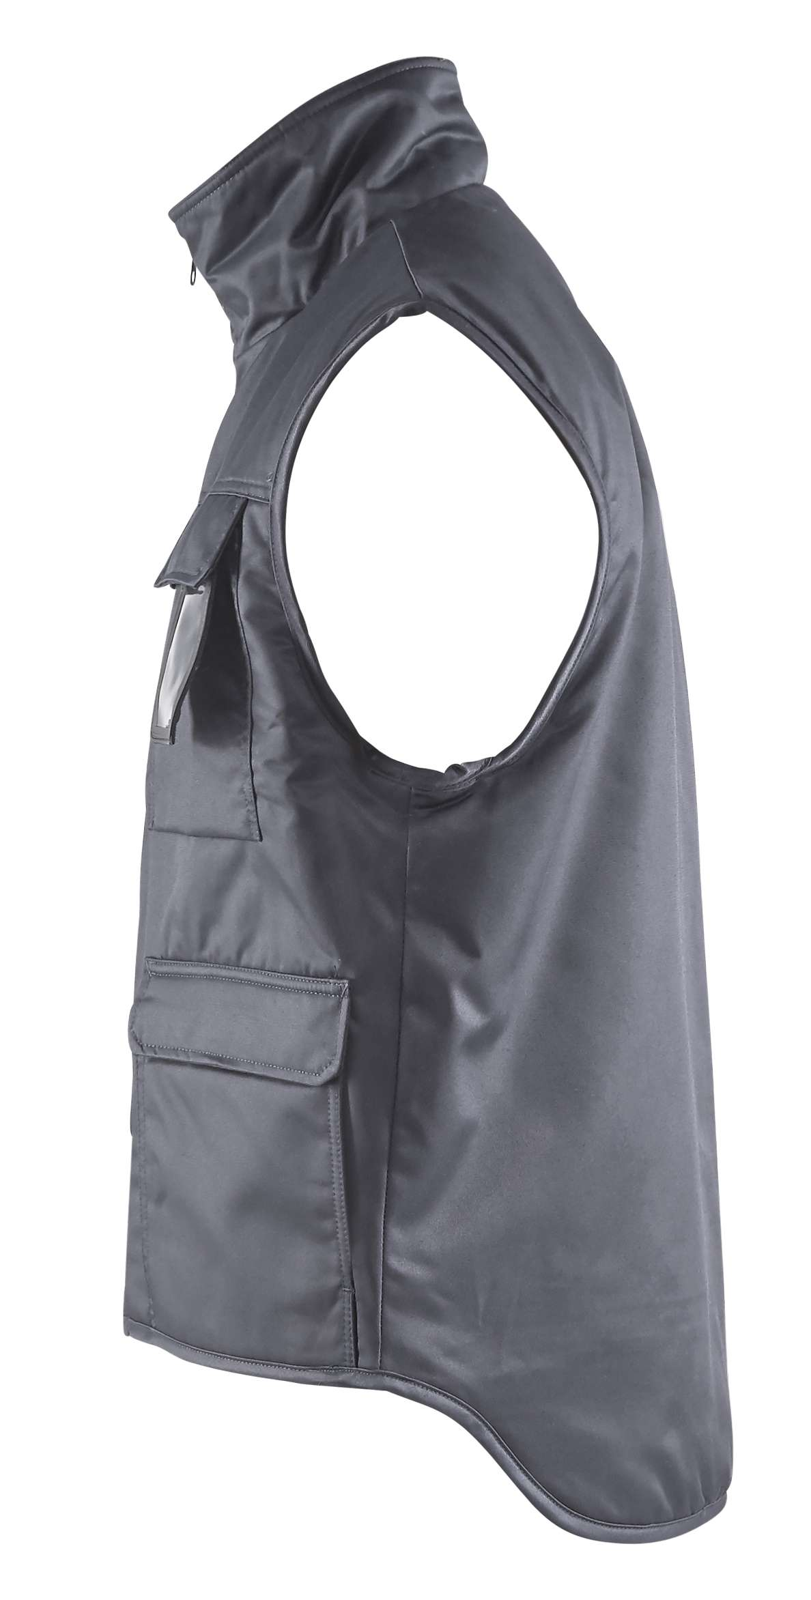 Blaklader Bodywarmers 38011900 grijs(9400)